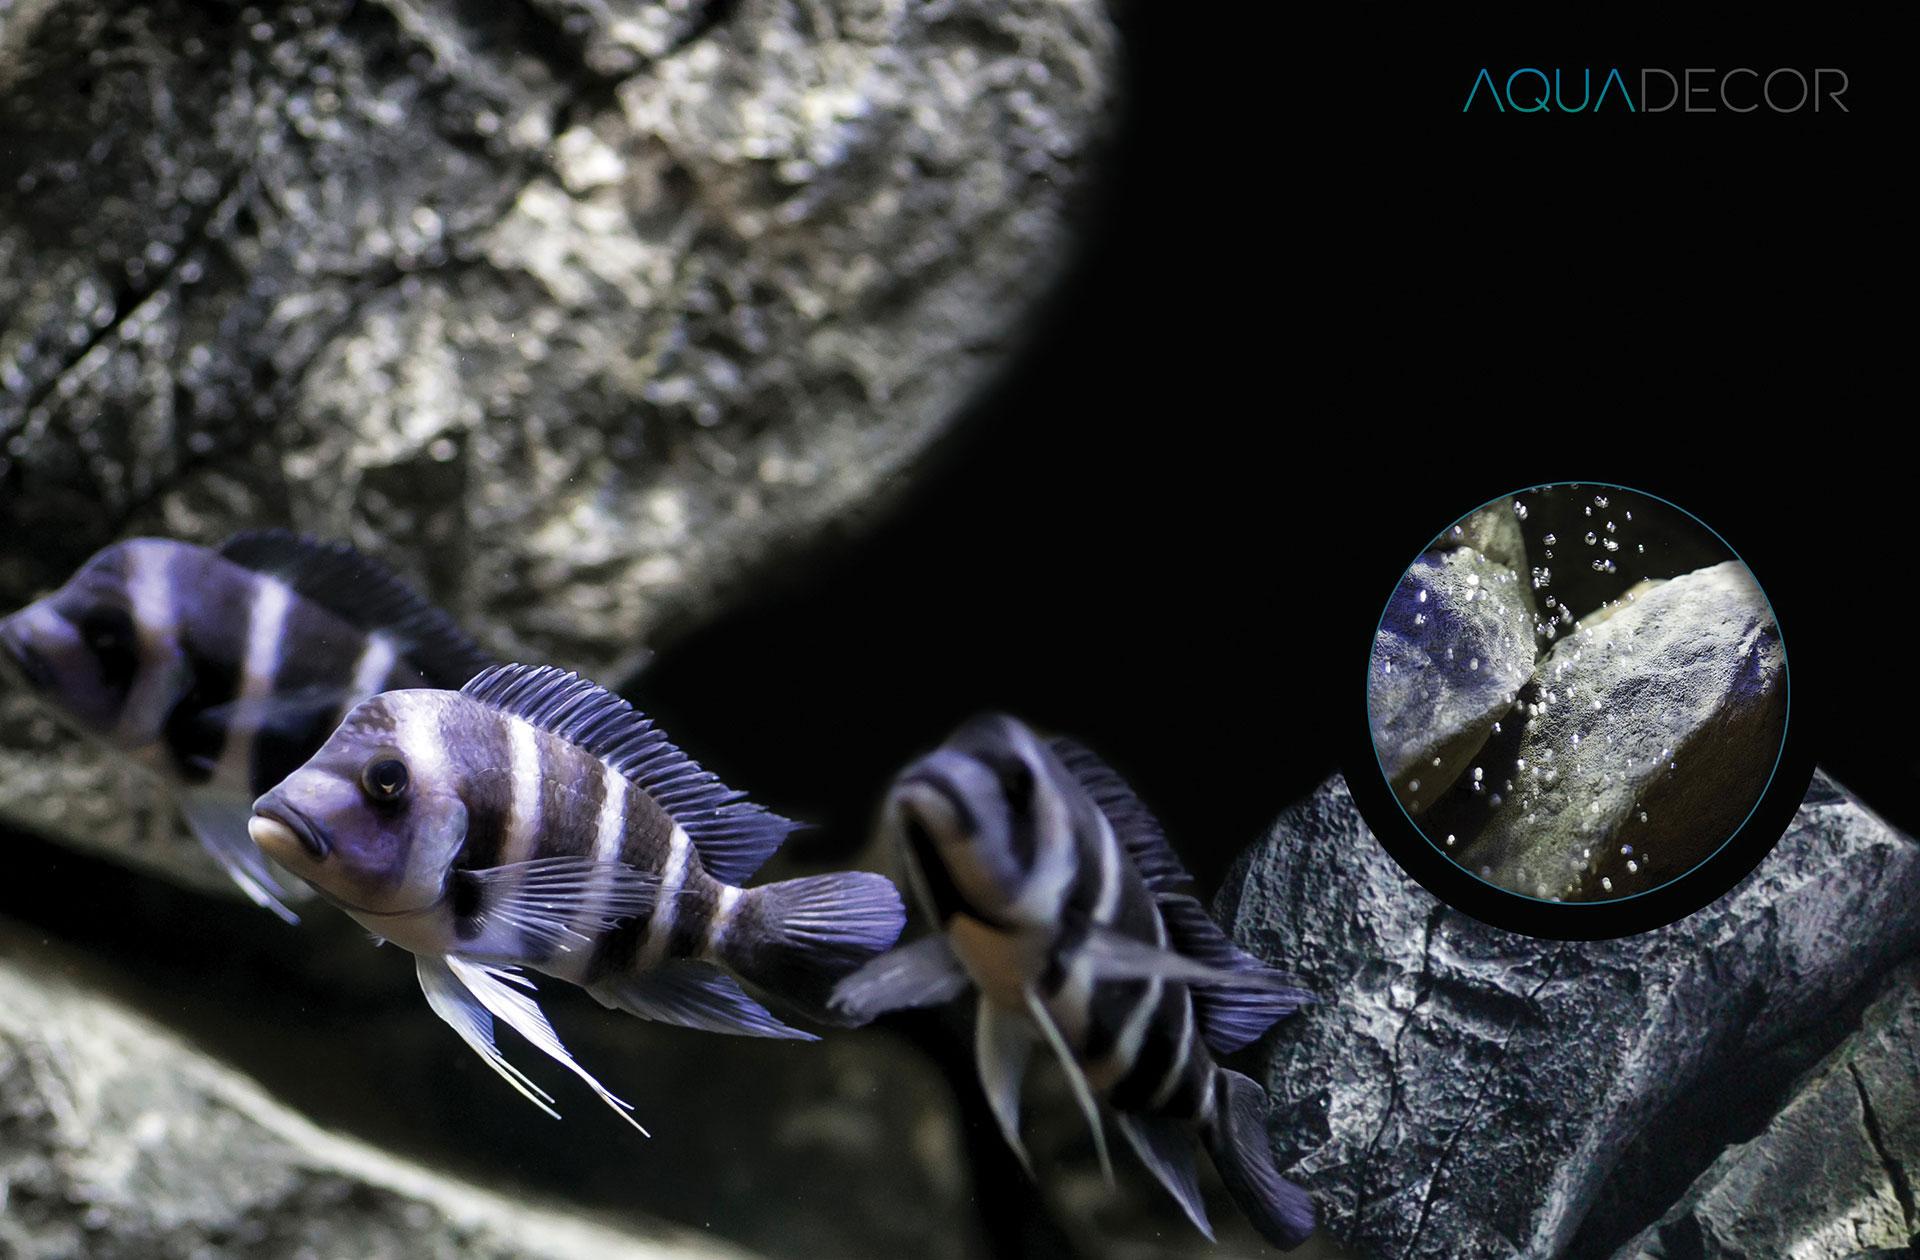 aquadecor-aquarium-backgrounds-experience